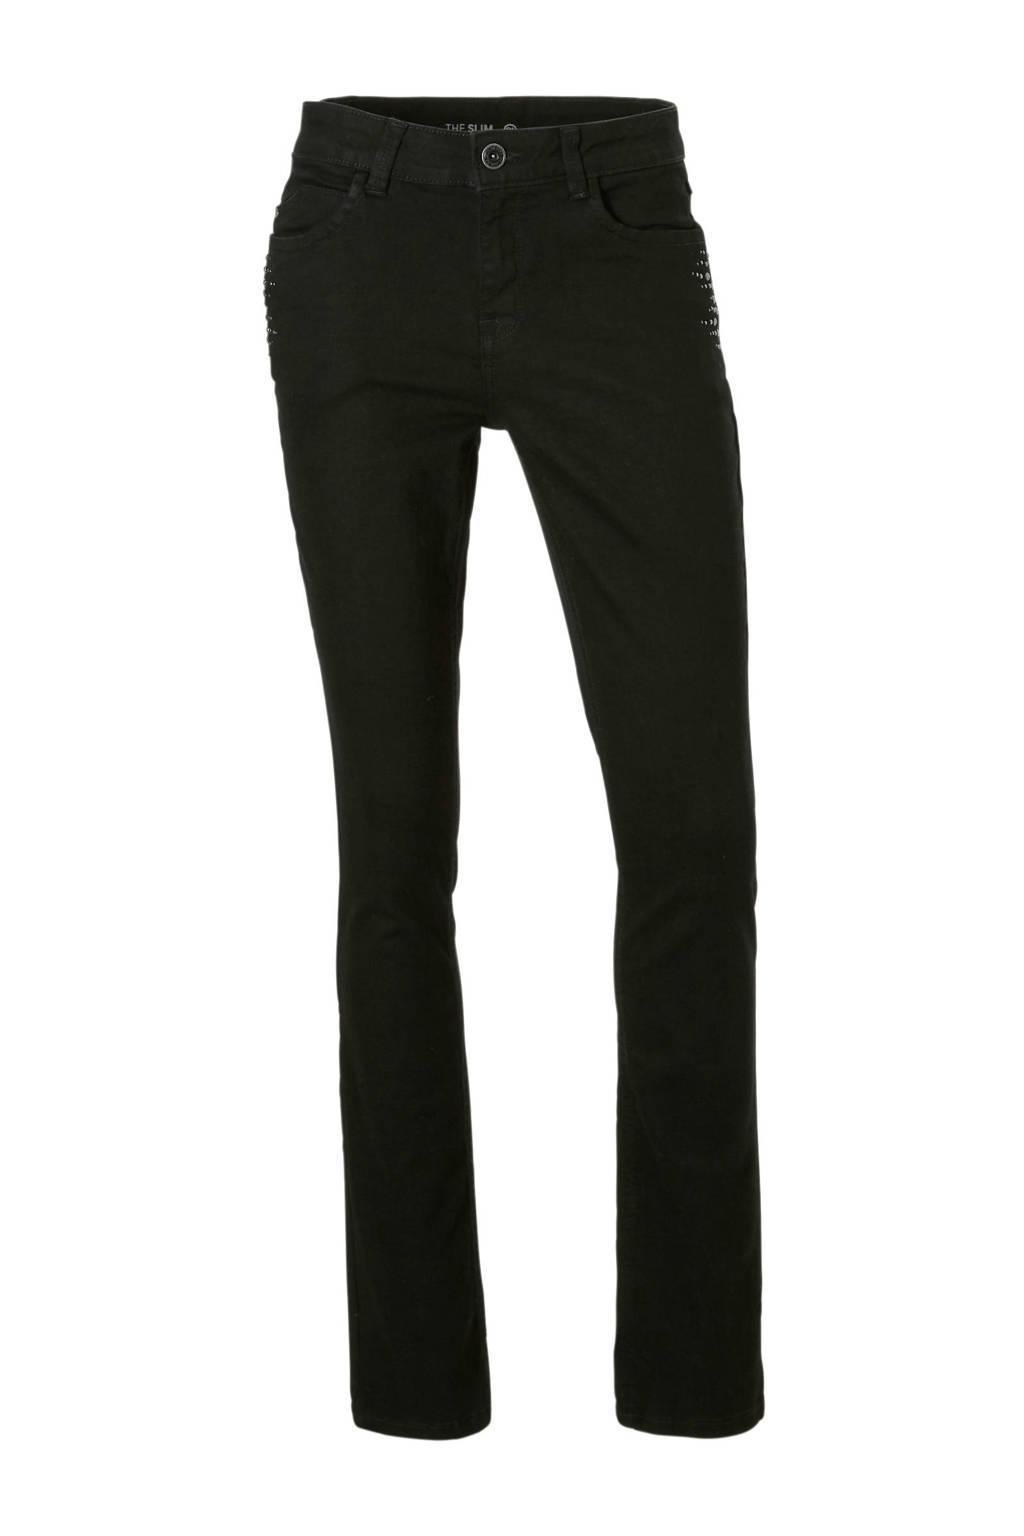 C&A The Denim slim fit jeans met studs zwart, Zwart